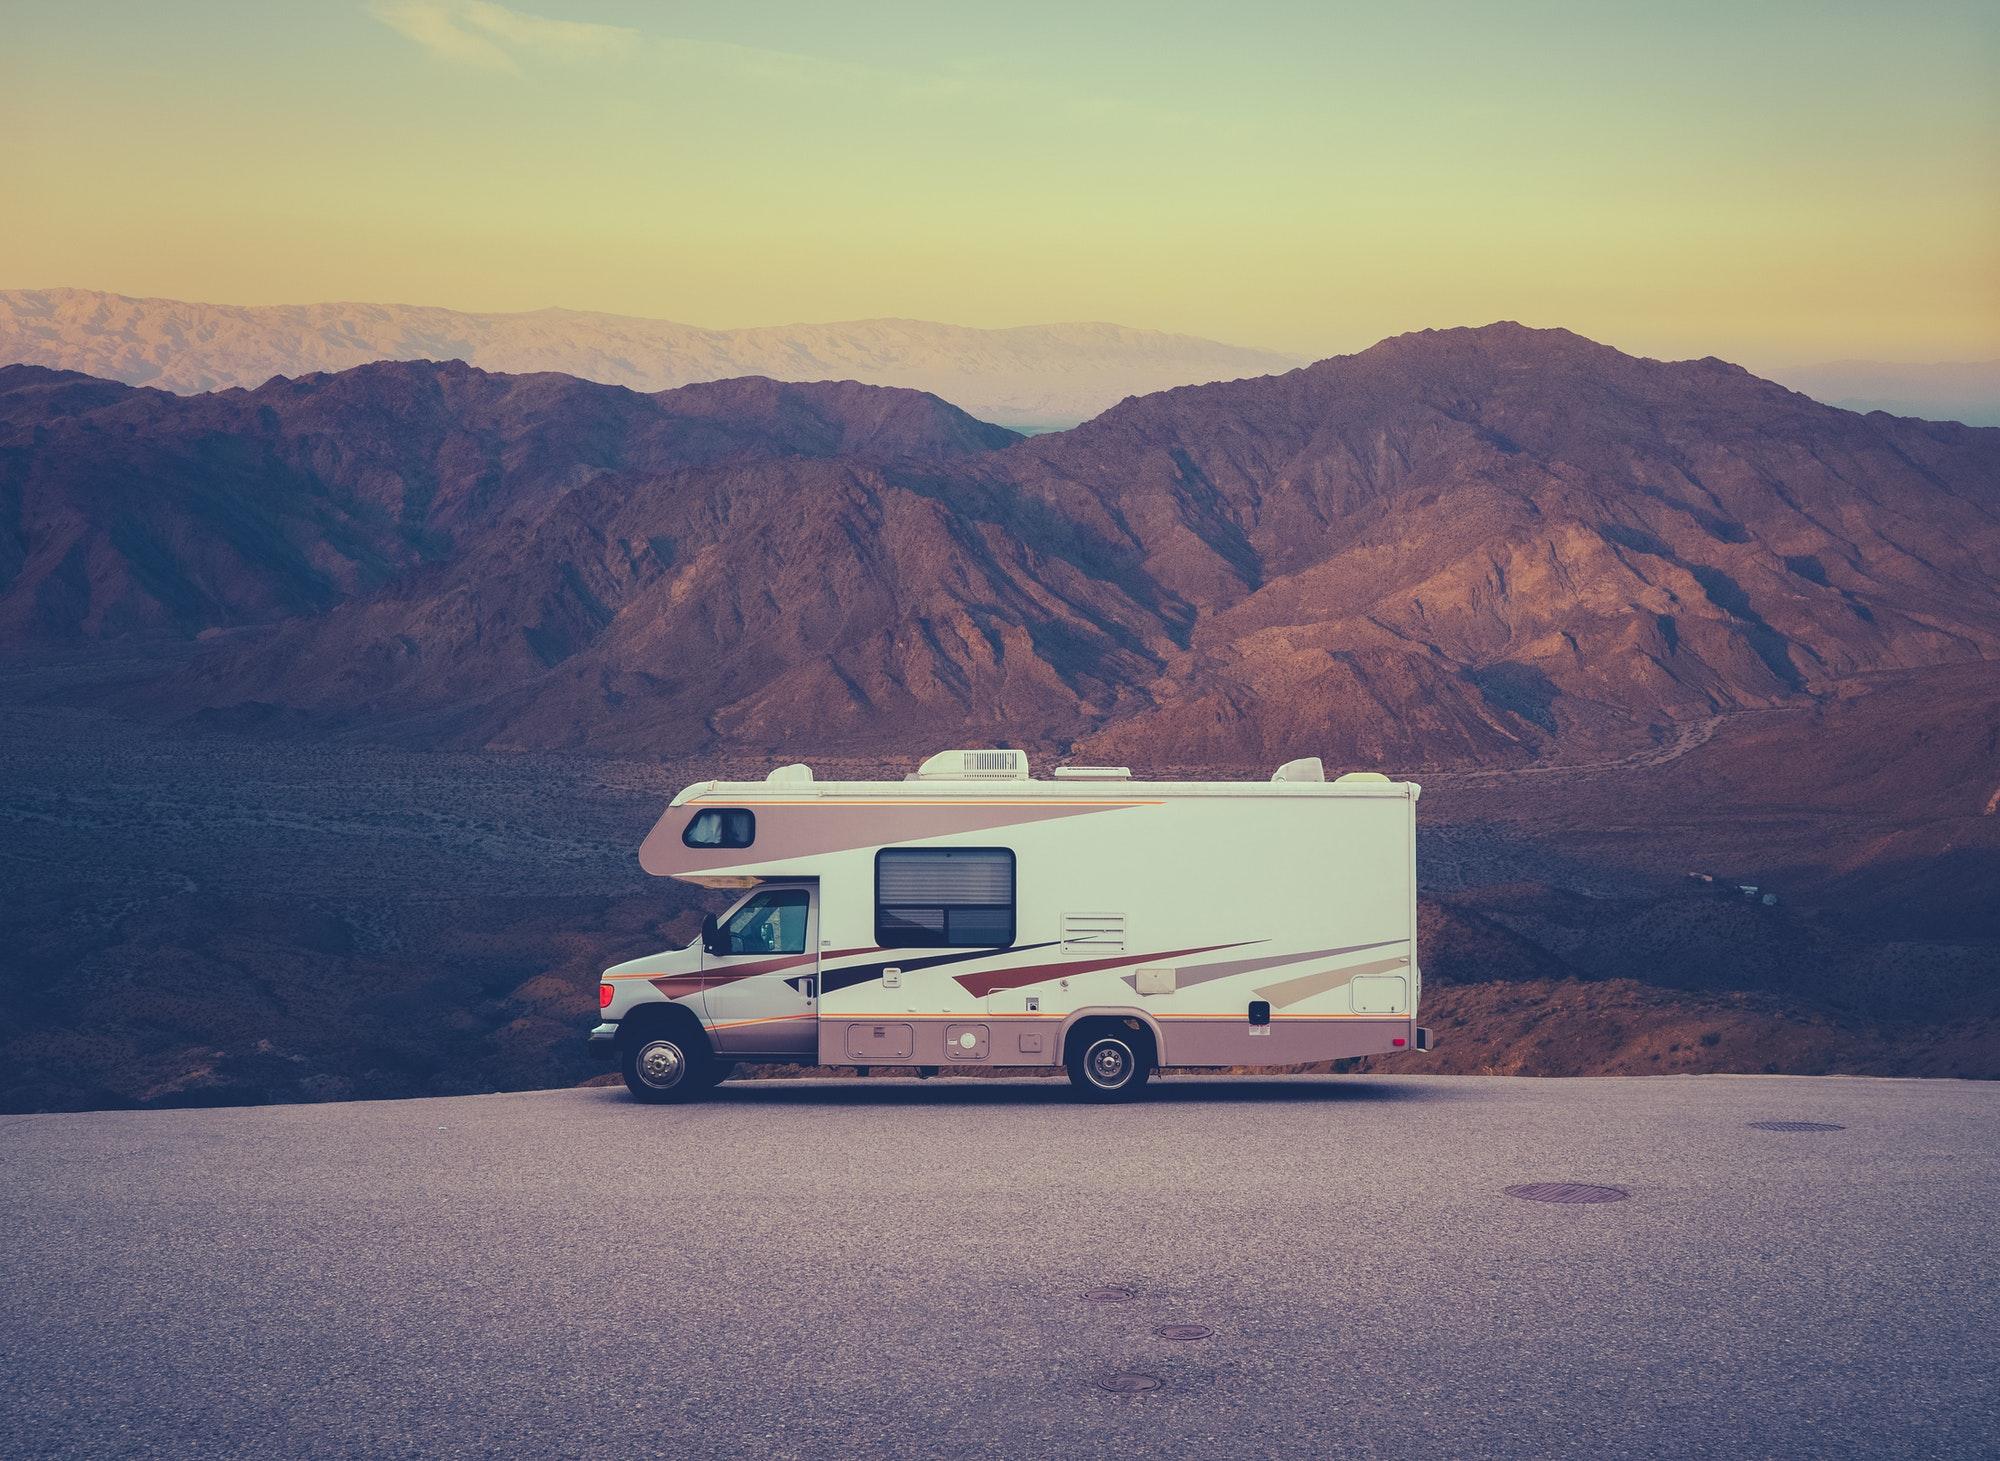 Retro RV Camper In The Desert